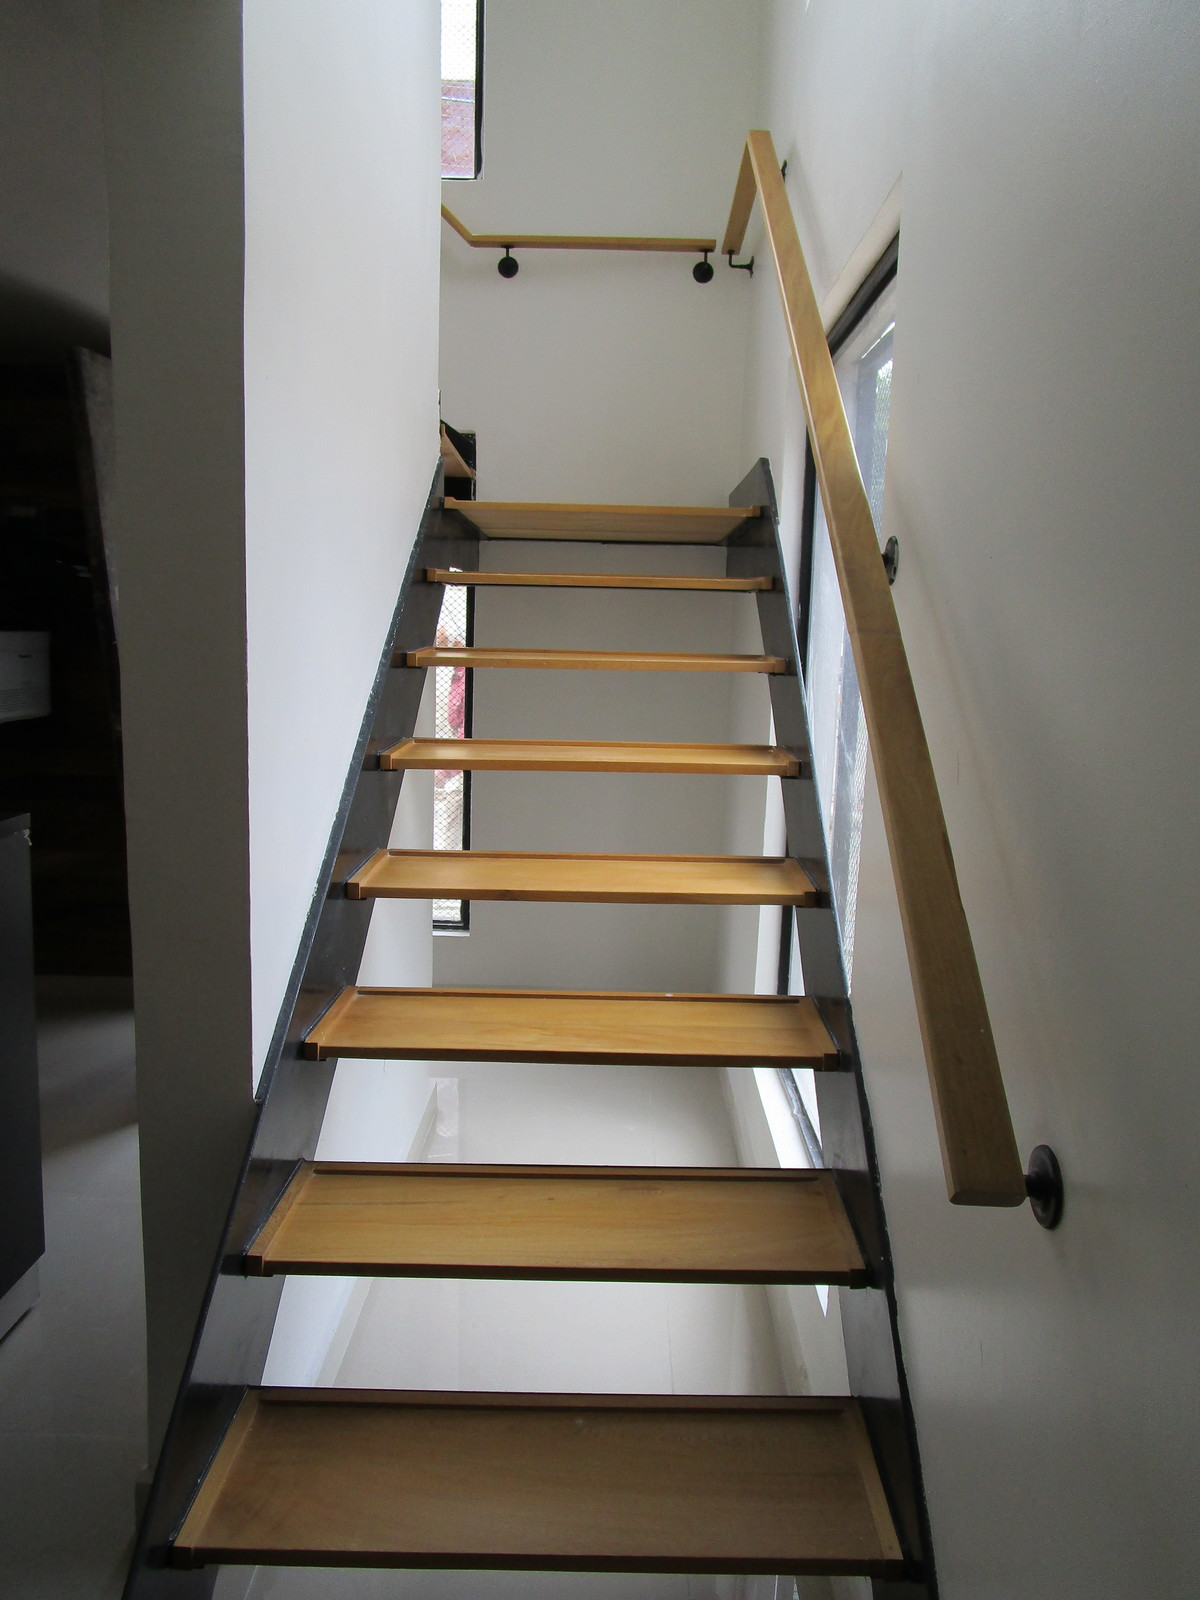 7 de 11: Escaleras de madera